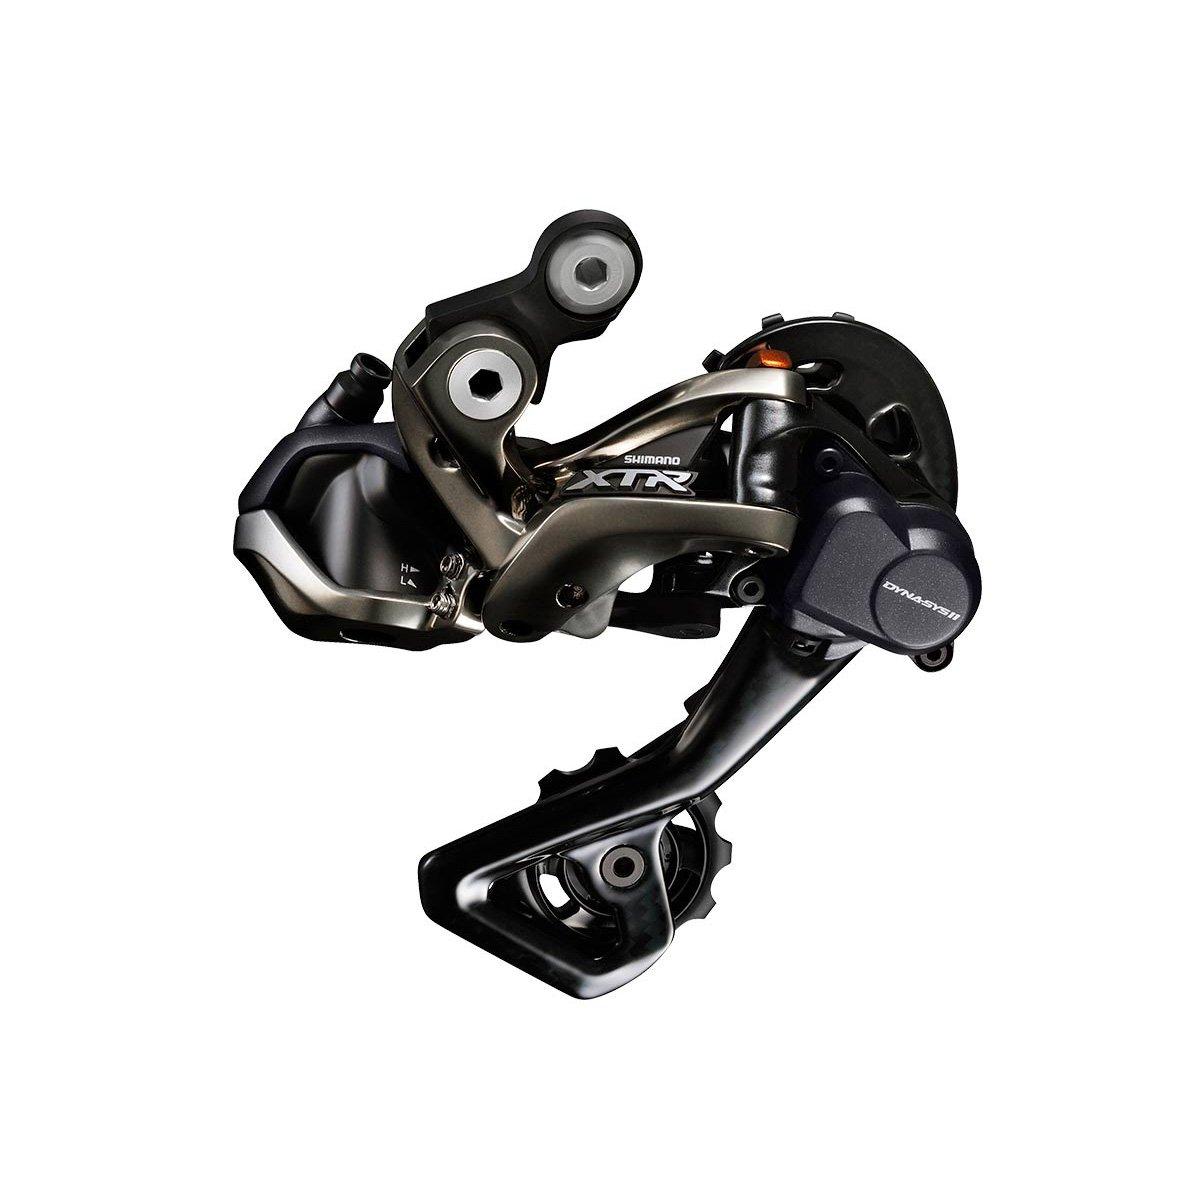 Shimano Xtr Di2 Rd M9050 Rear Derailleur Sports Wiring Kit Outdoors